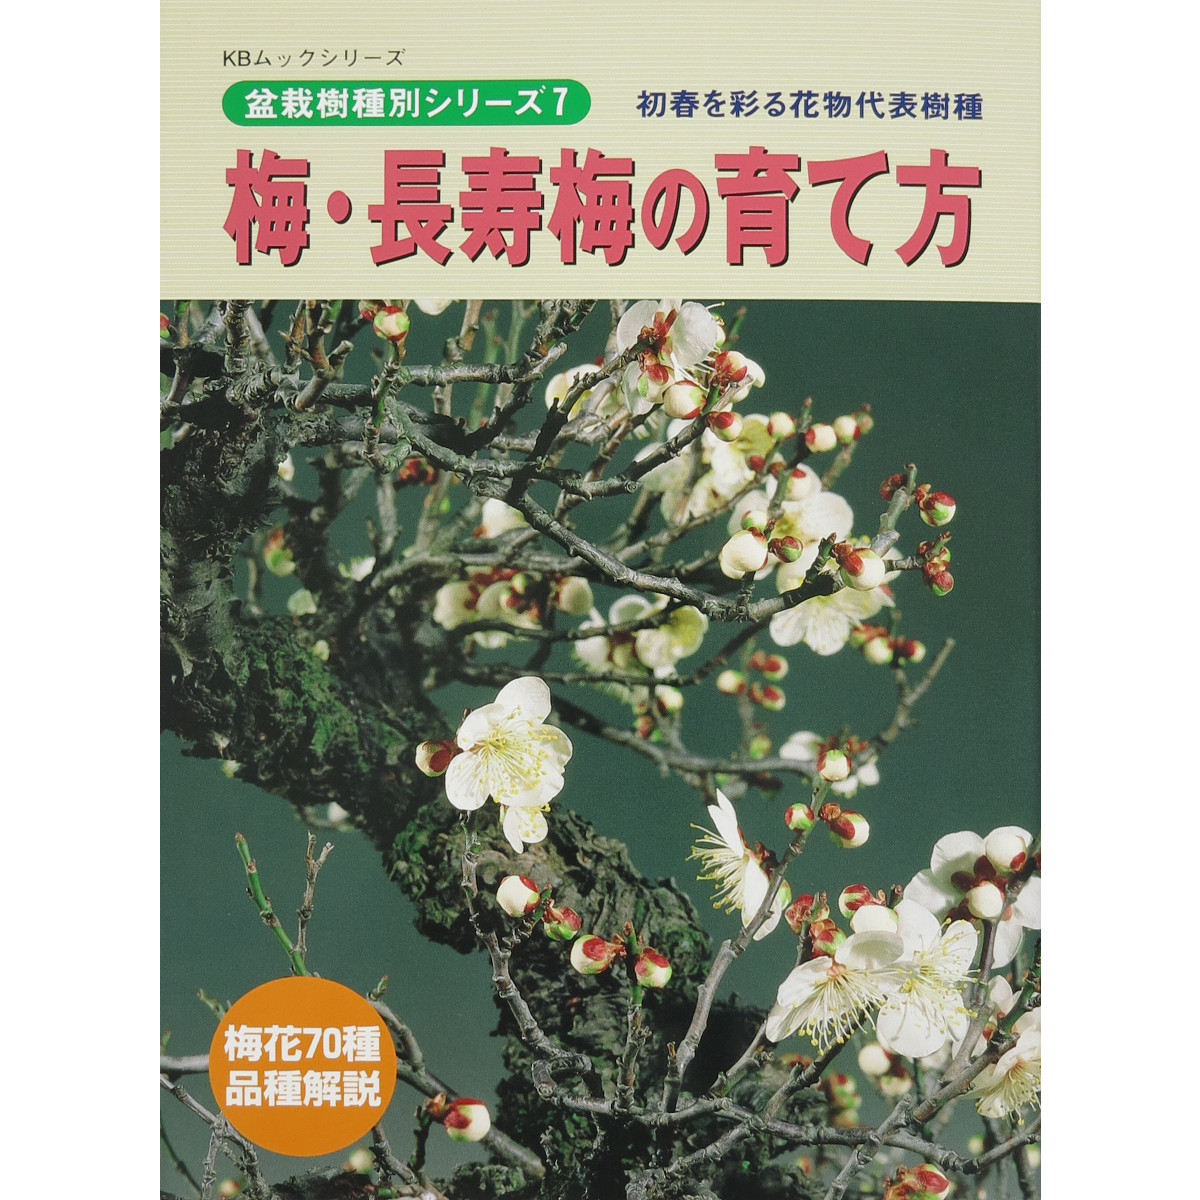 livre kinbon prunus mume - cover